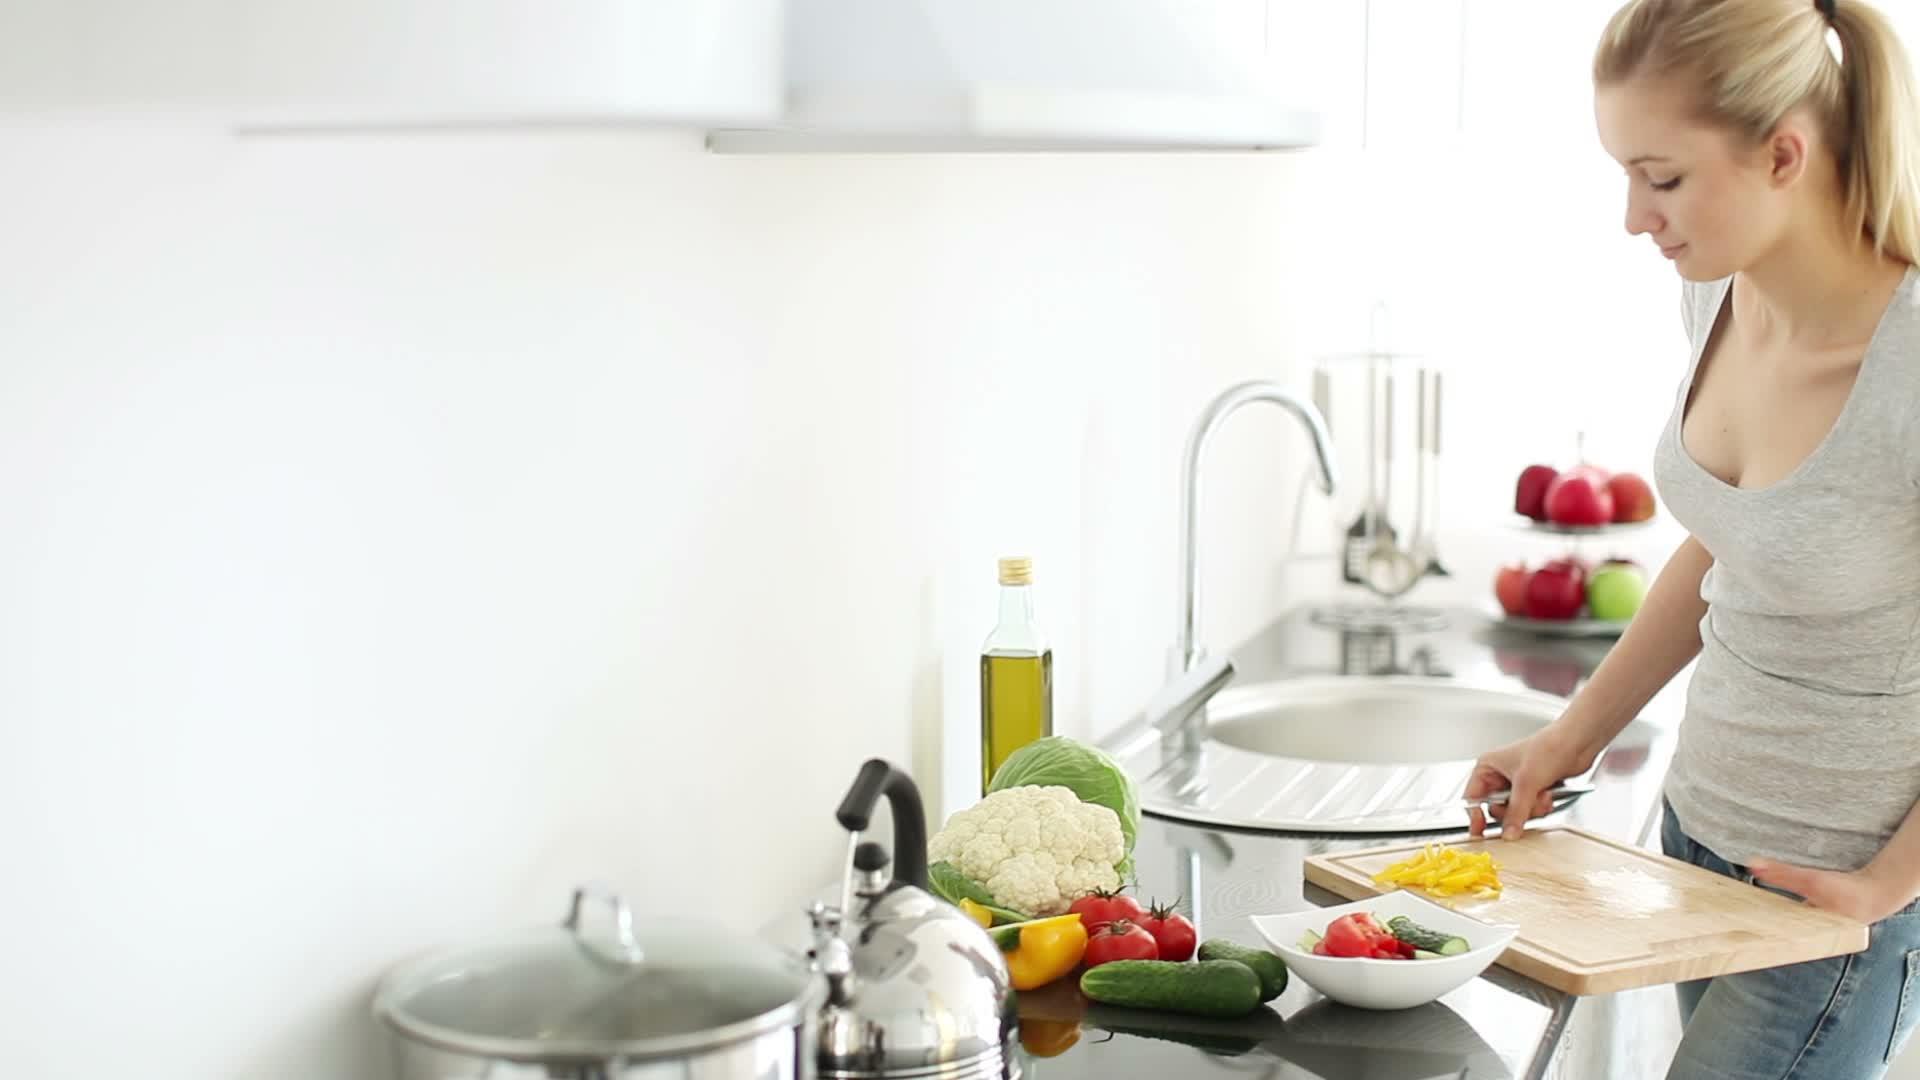 домработницу на кухне